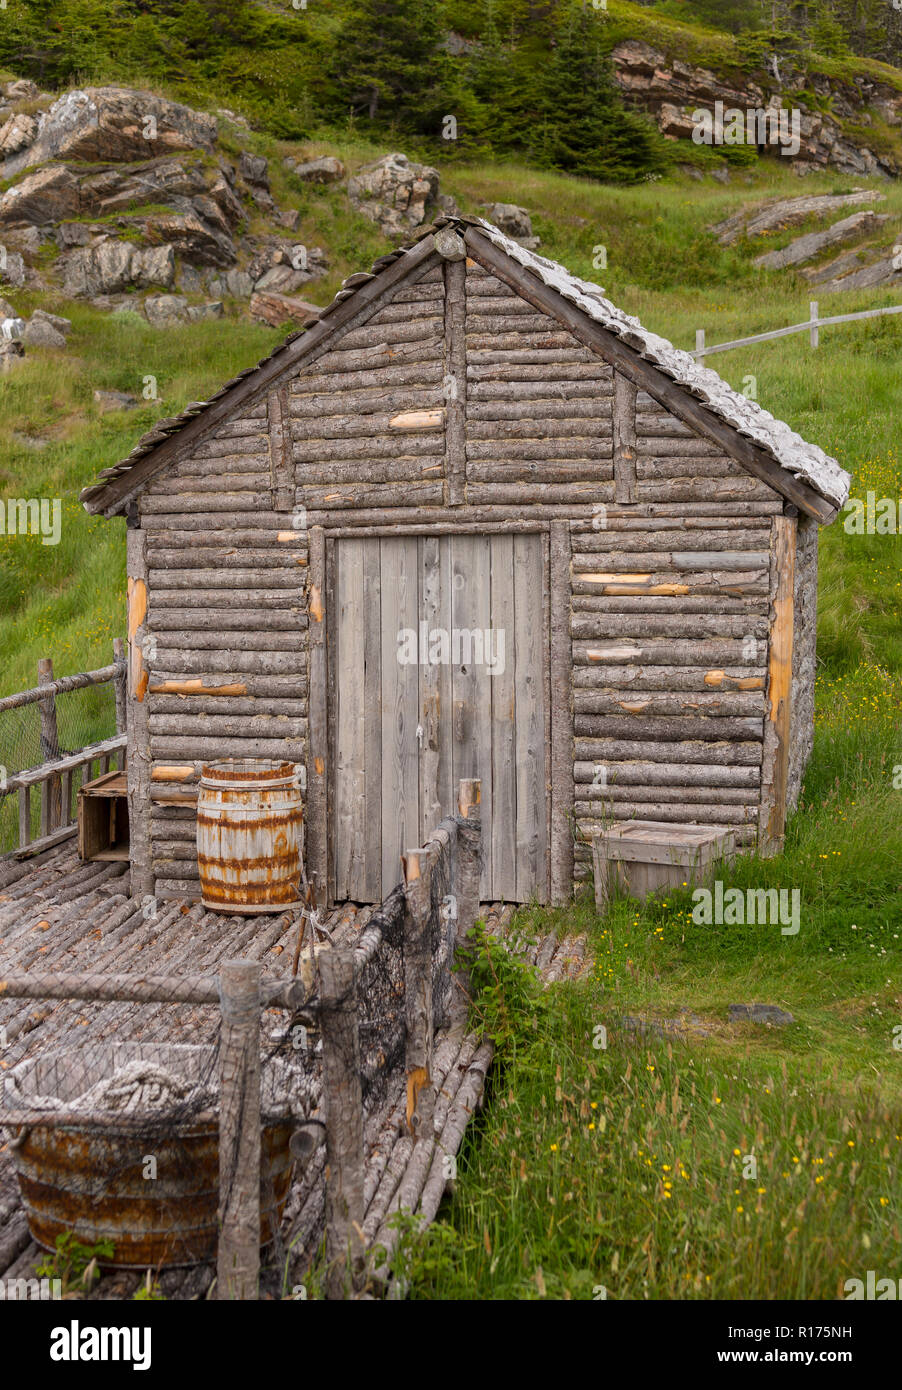 CAPE RANDOM, NEWFOUNDLAND, CANADA - Random Passage movie set, replica of fishing village. - Stock Image